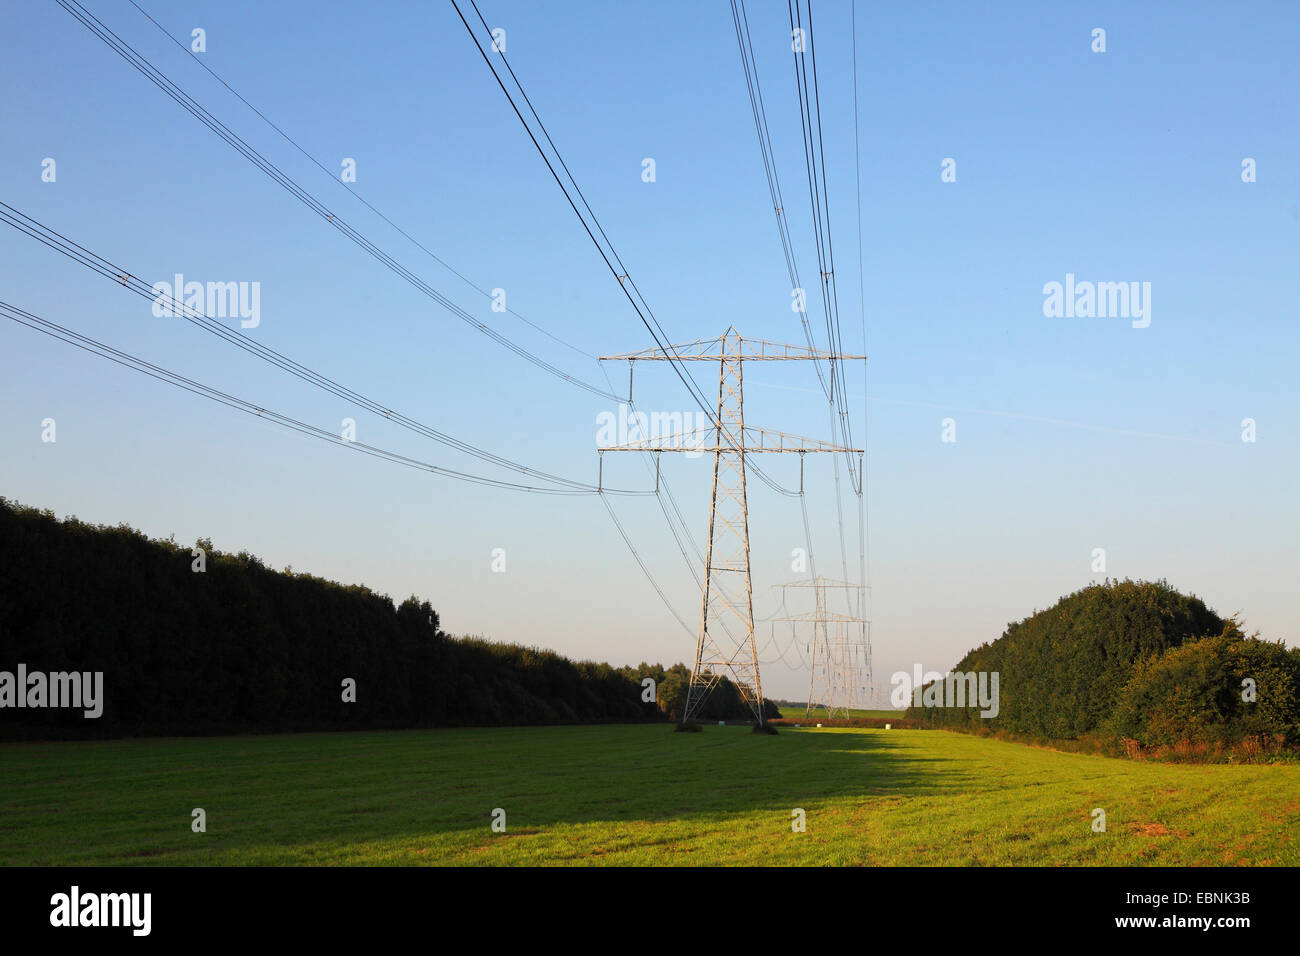 transmission power lines, Netherlands, Flevoland - Stock Image